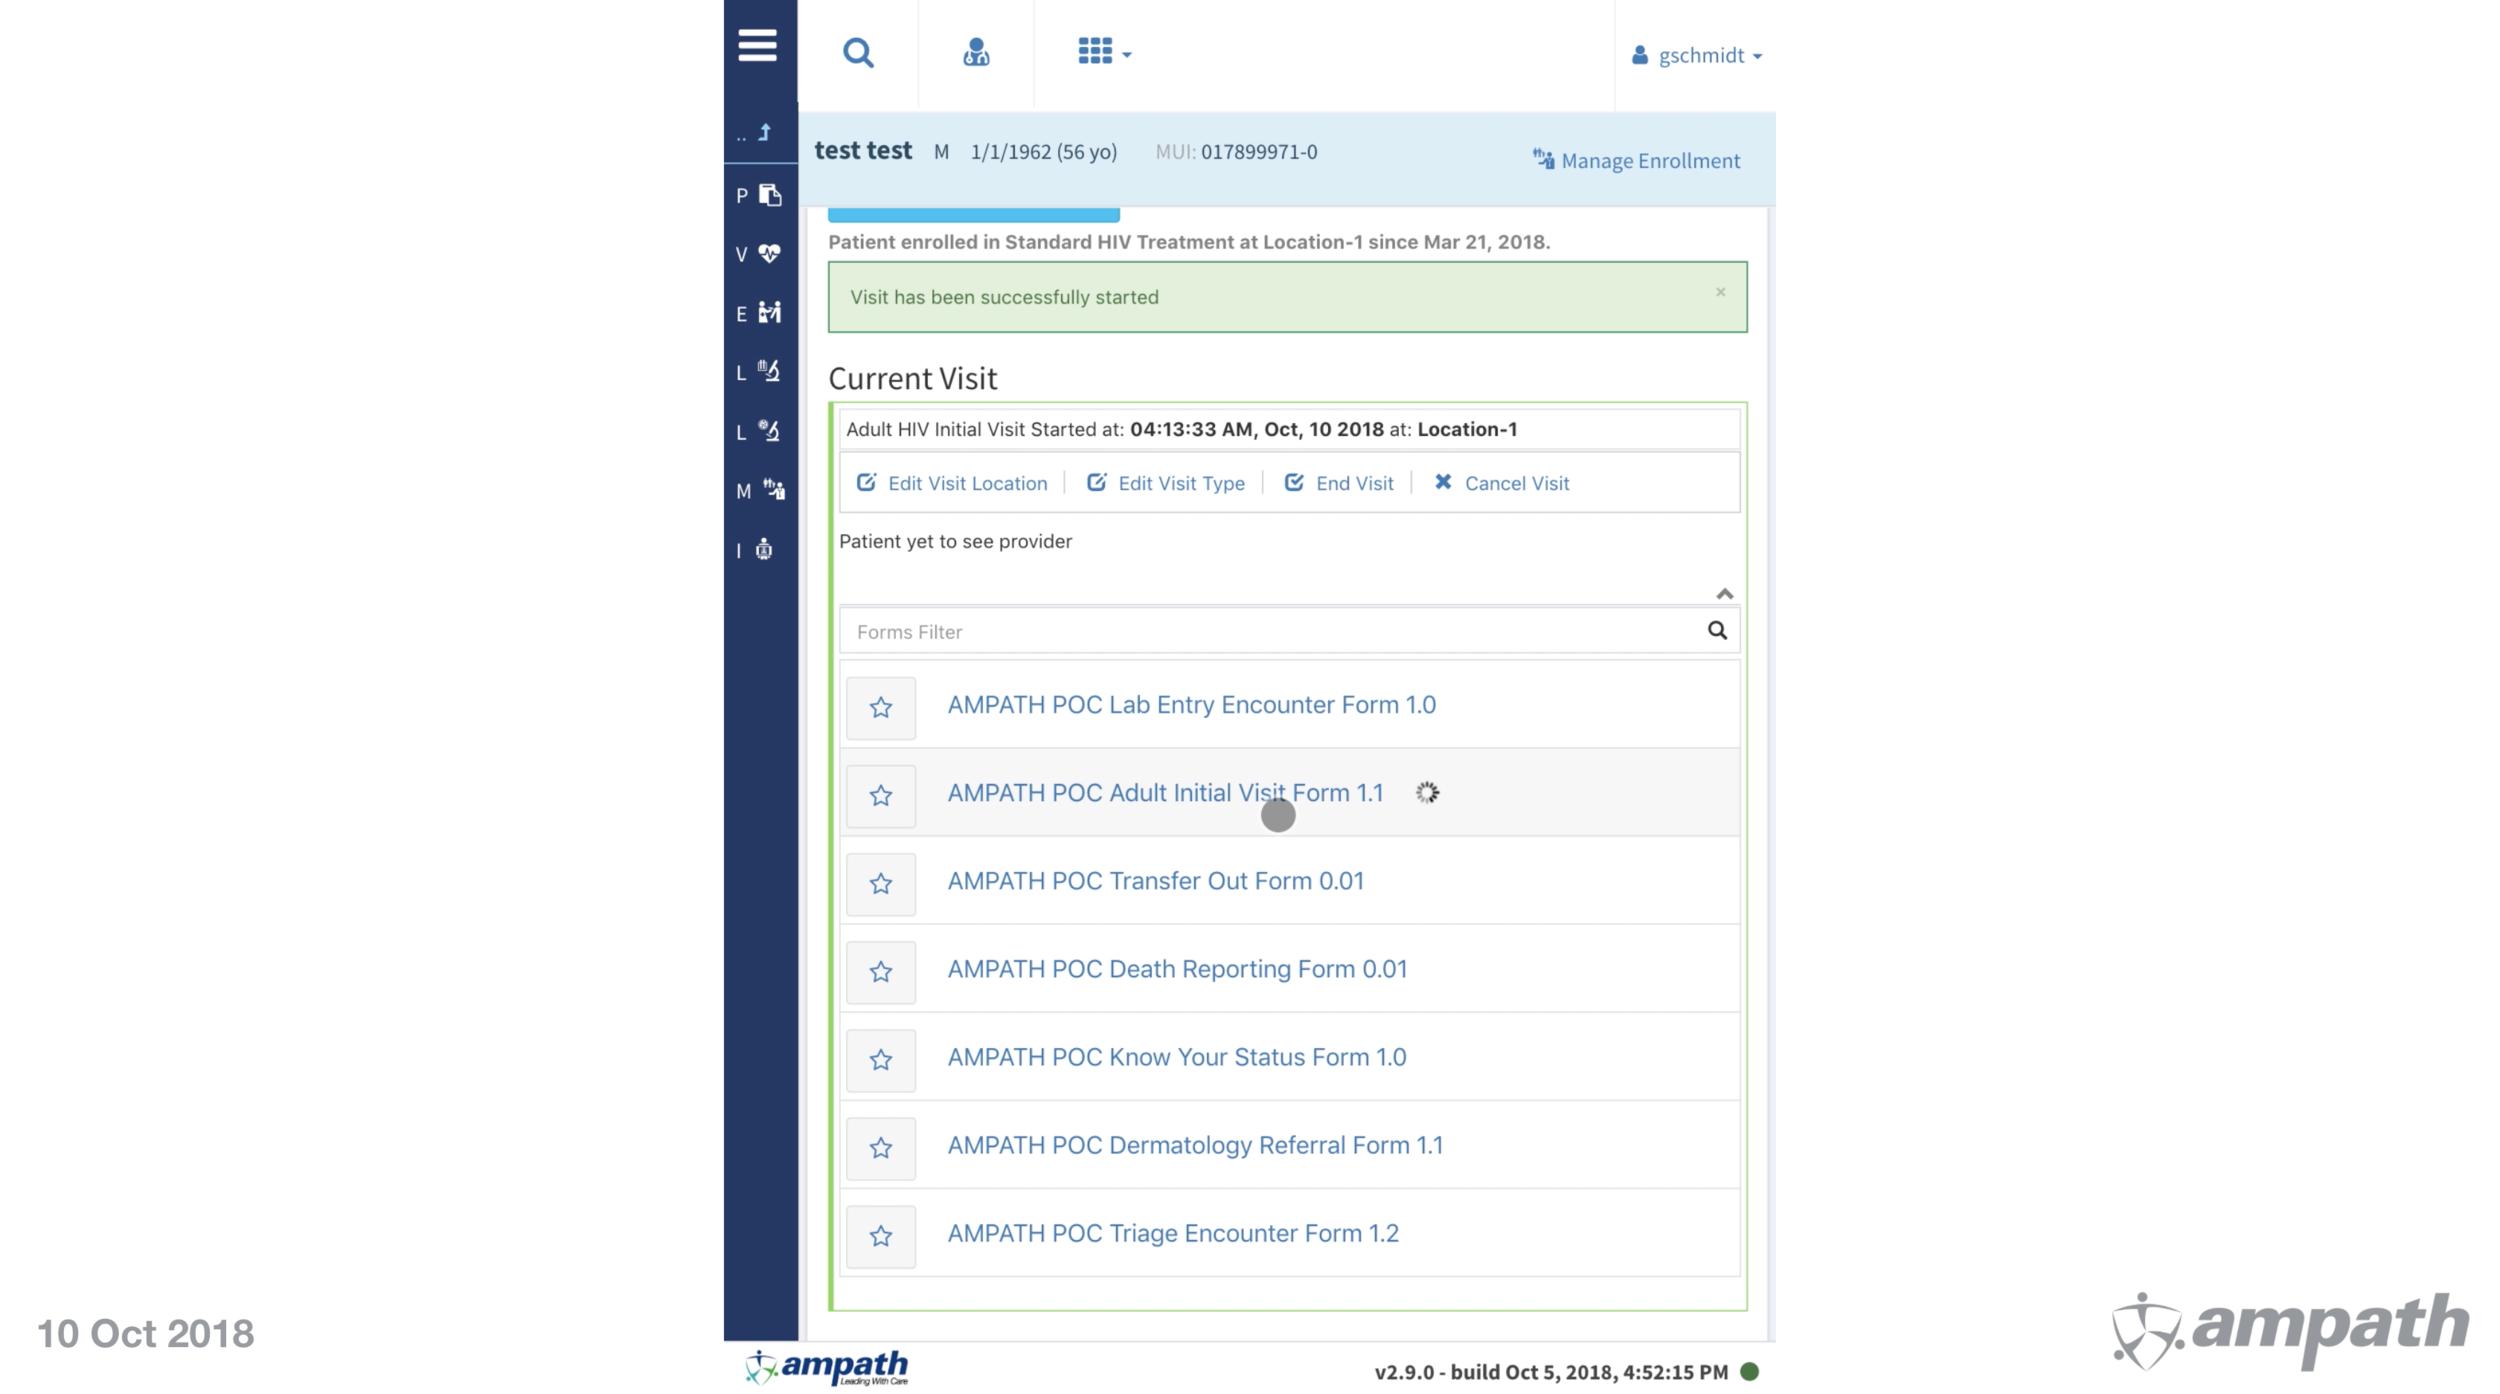 Screenshot 2018-10-18 11.41.17.png